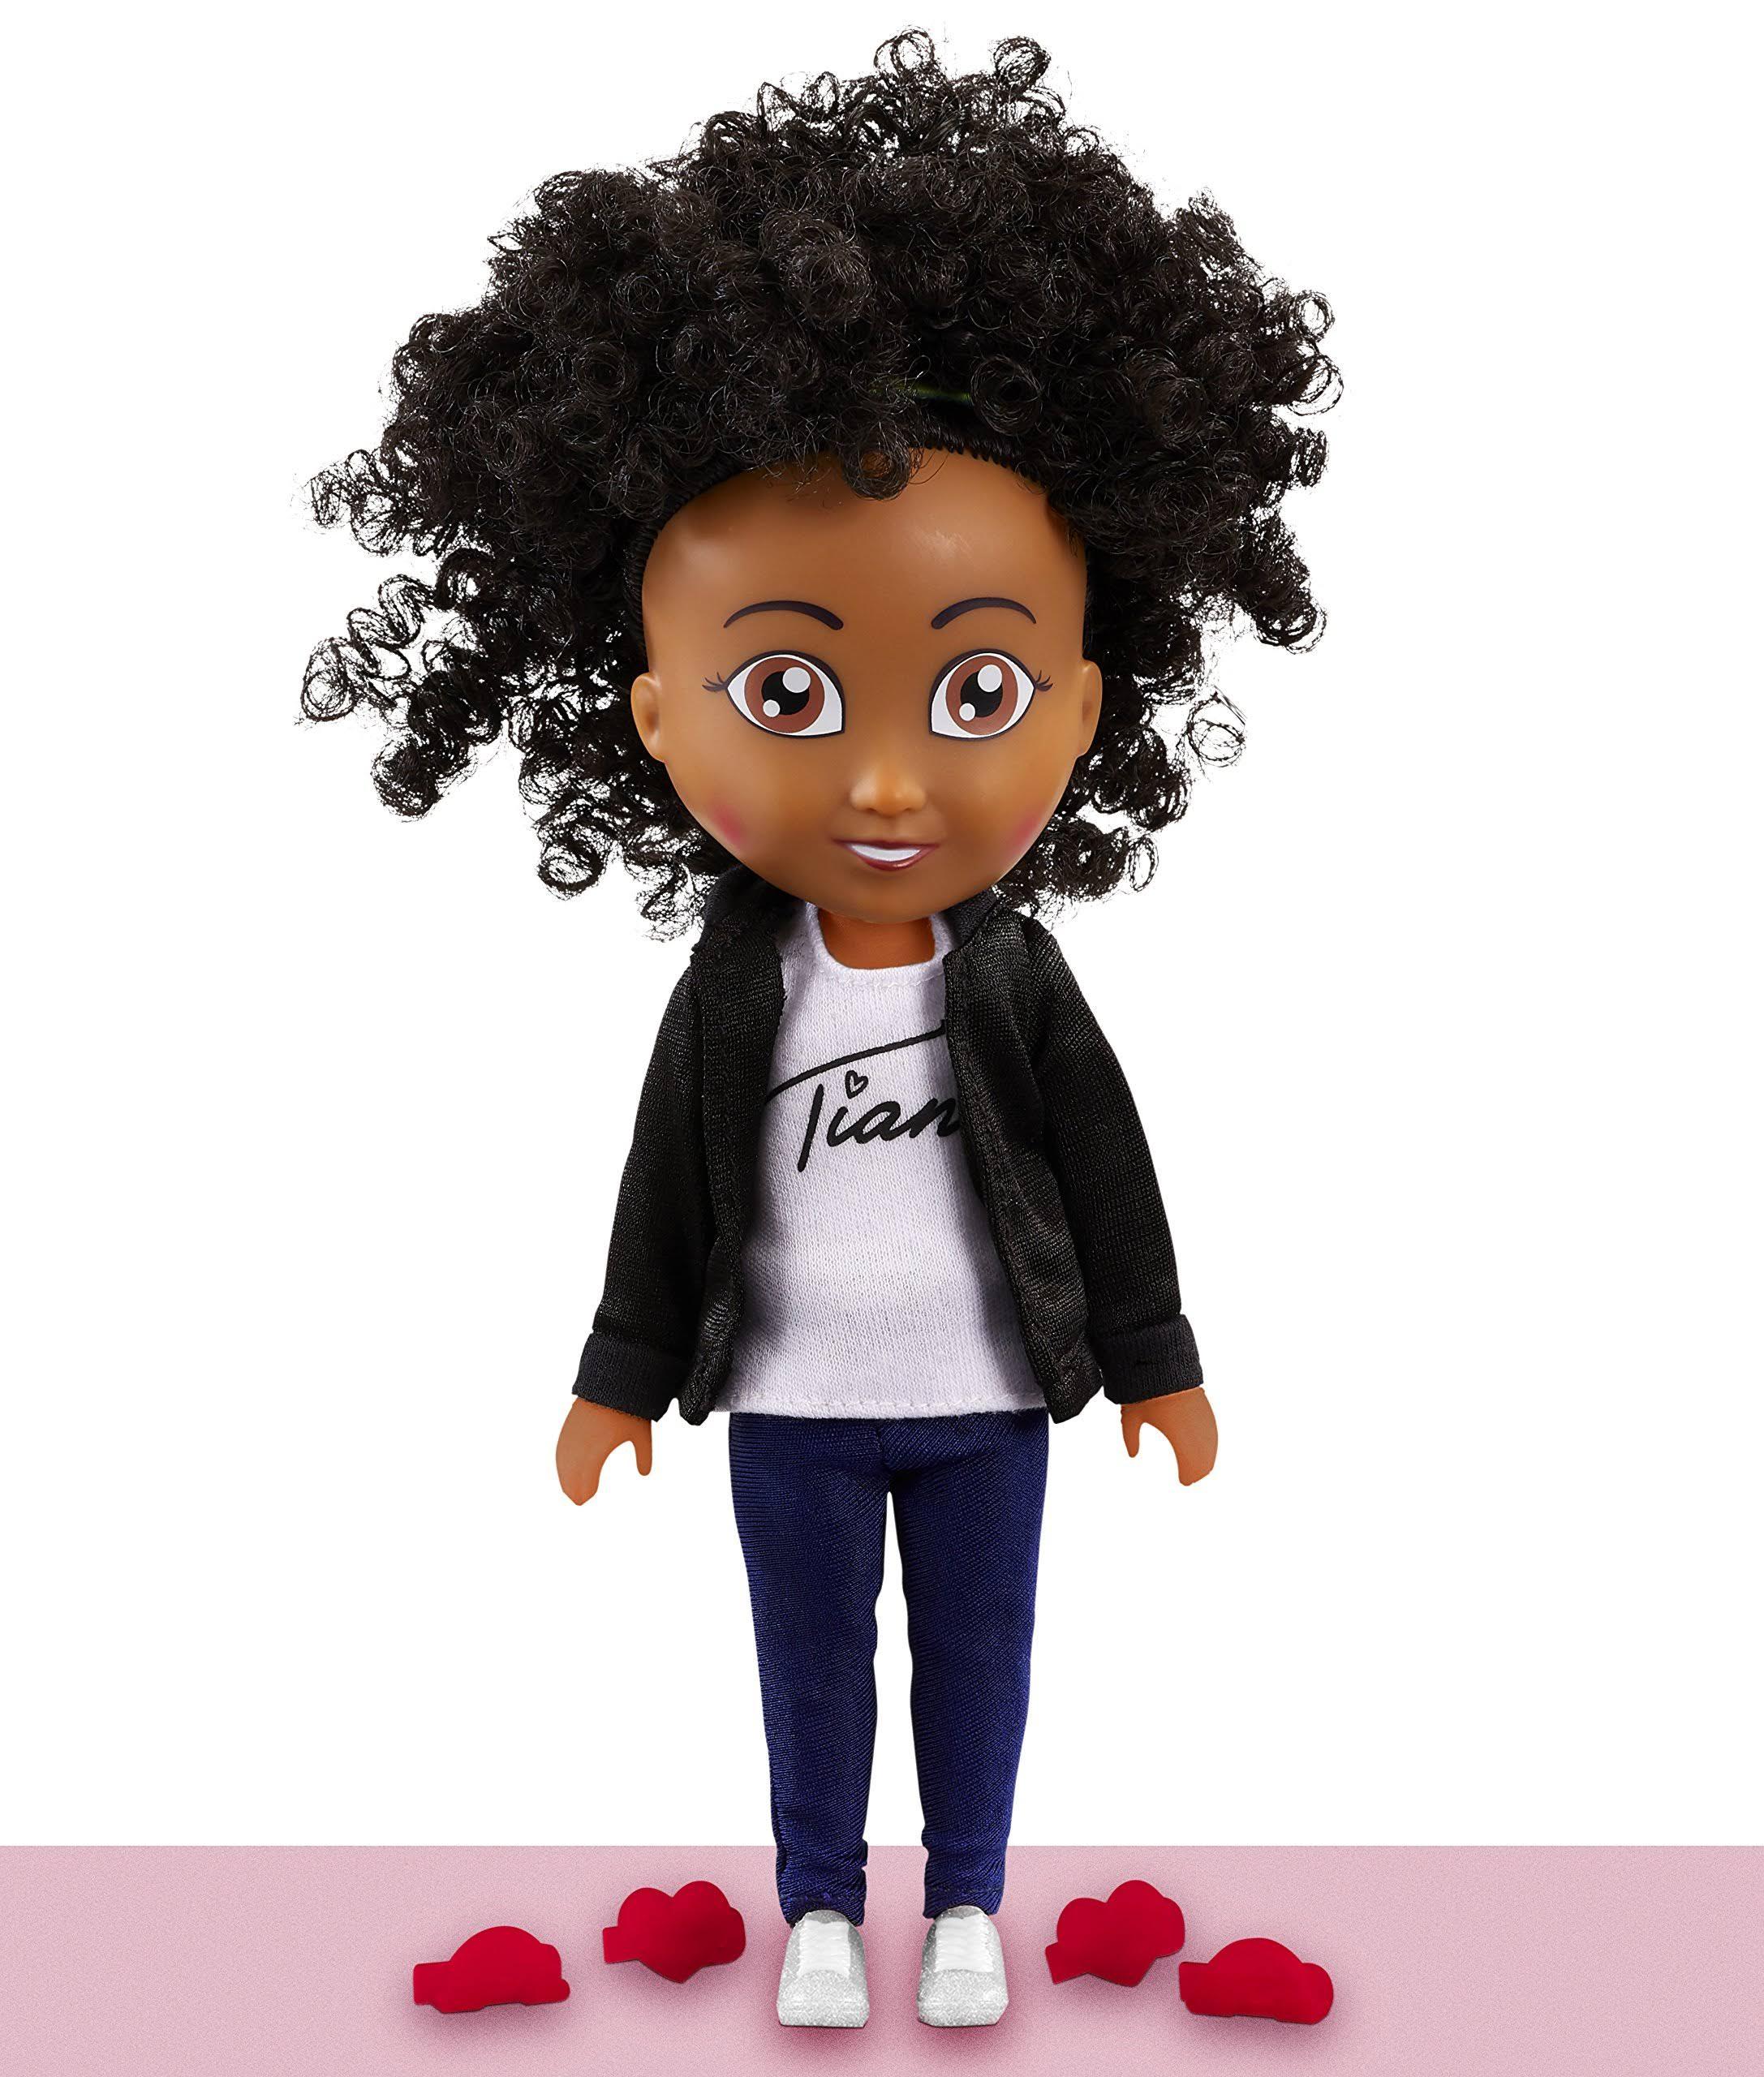 Tiana TT squad doll £1.99 home bargains